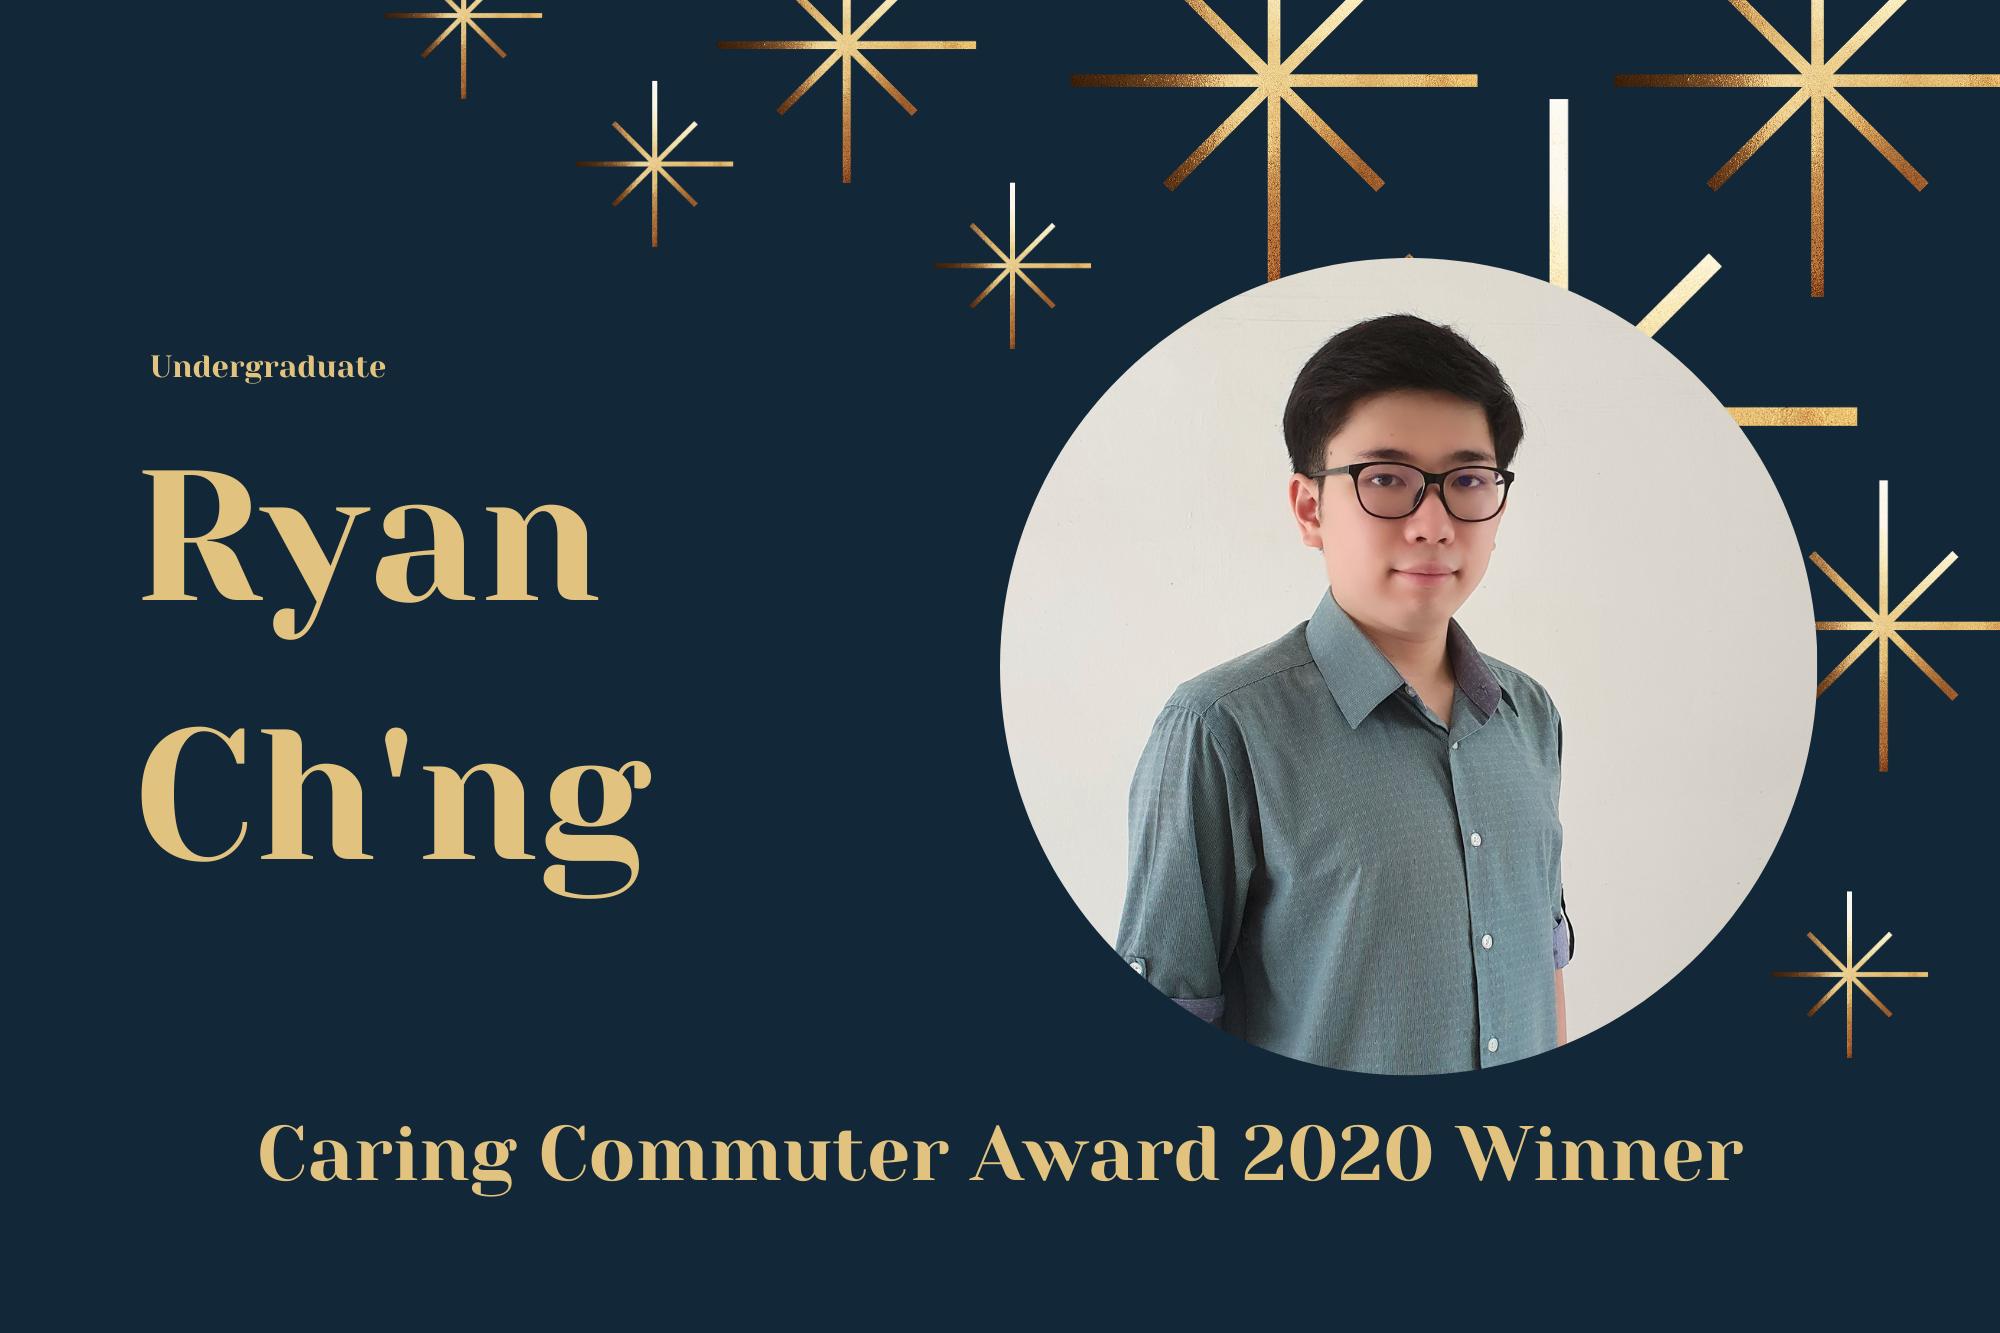 Meet Ryan, Undergraduate and Caring Commuter Award 2020 Winner